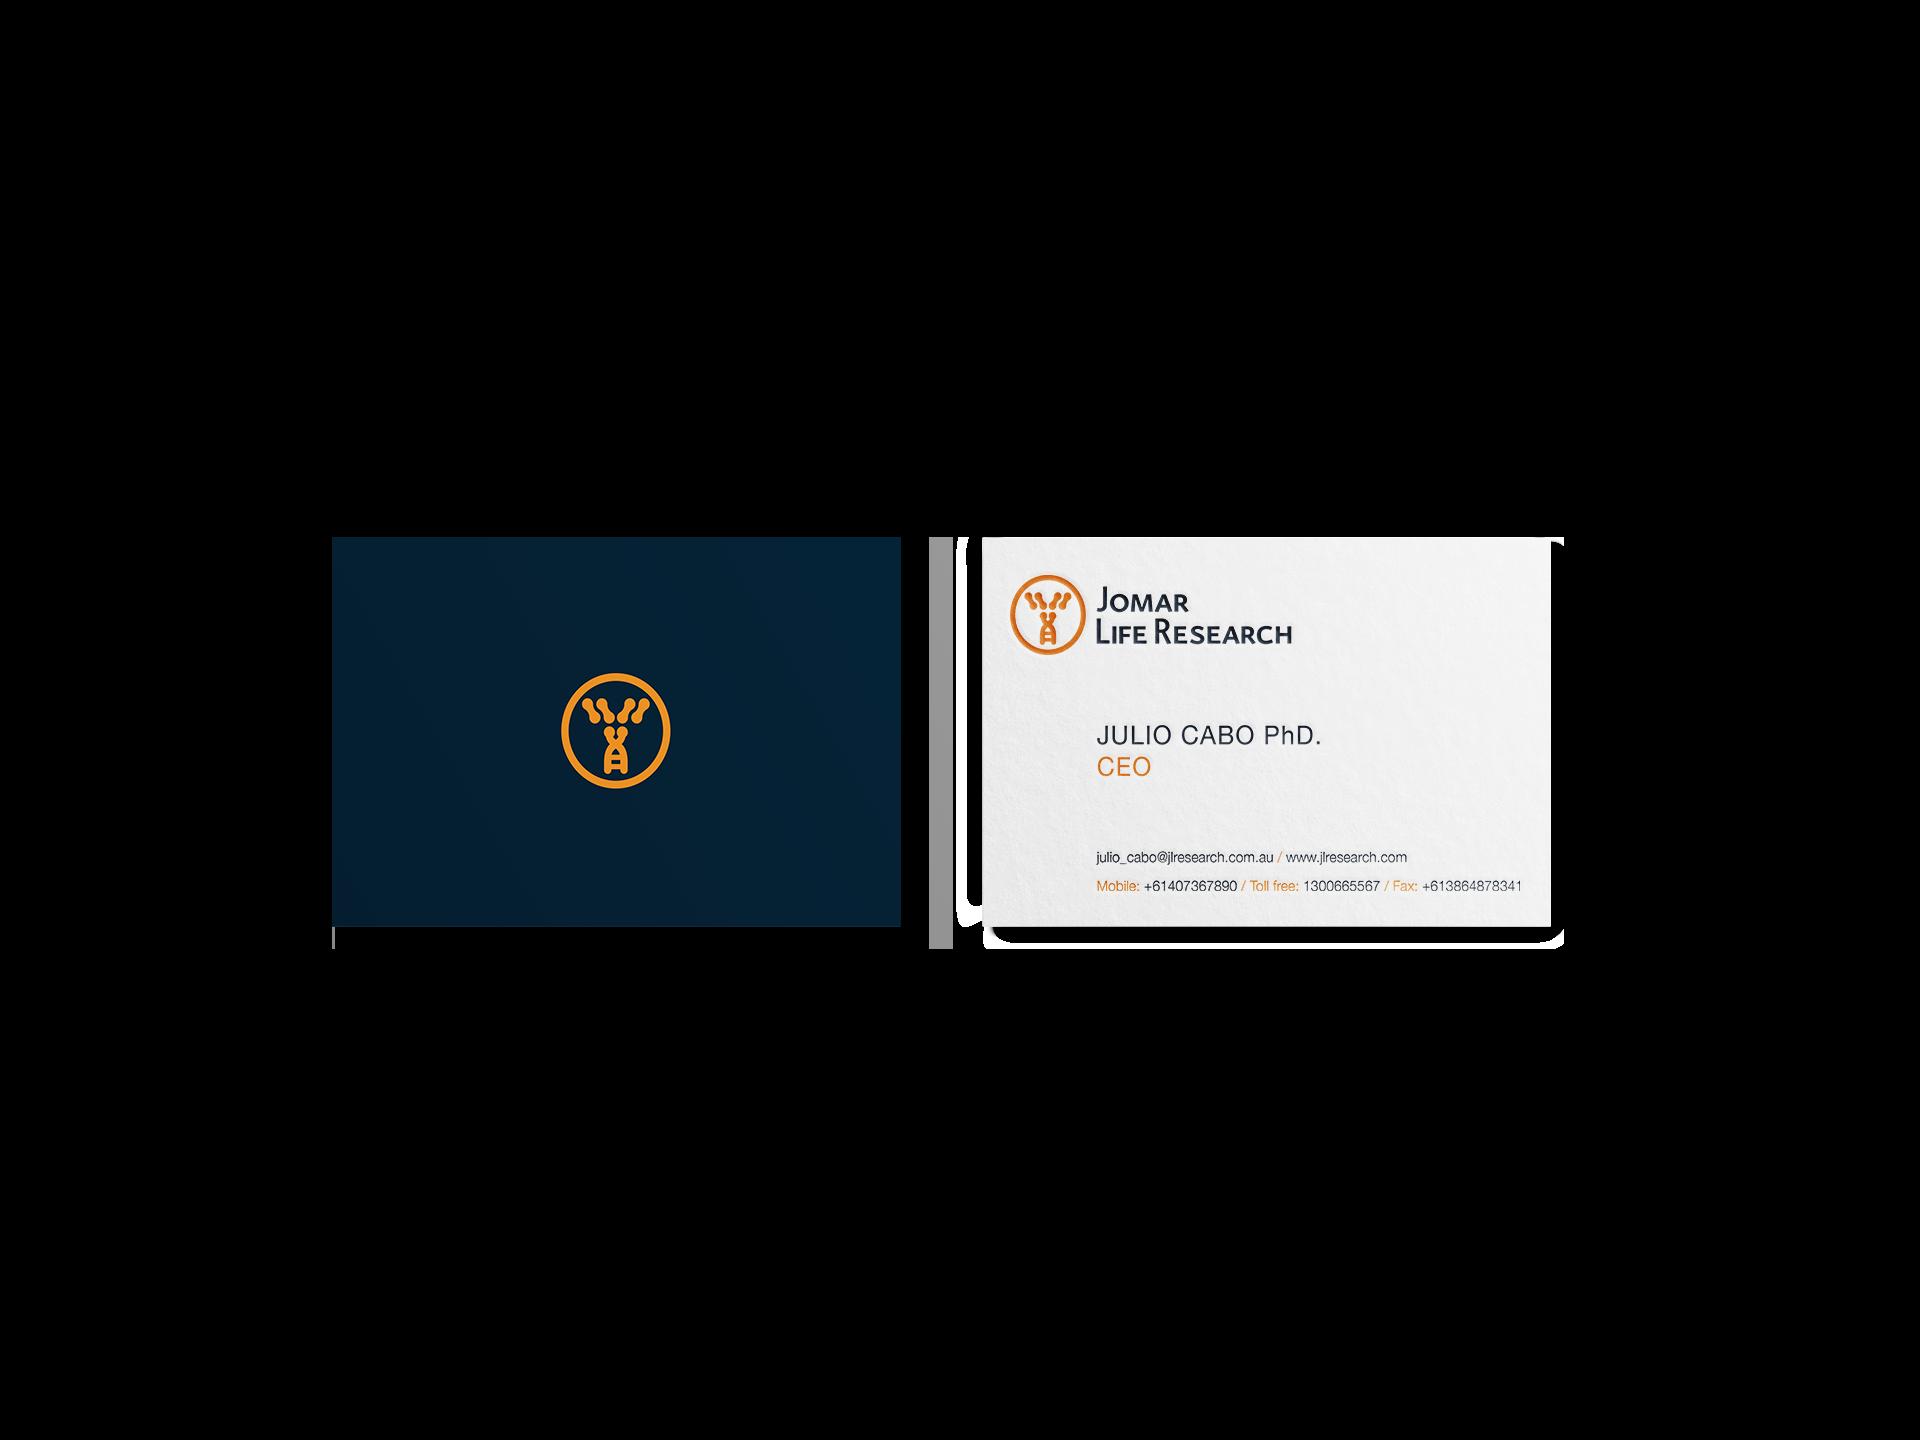 Jhonatan_Medina_Caguana_JLR_CARD_2